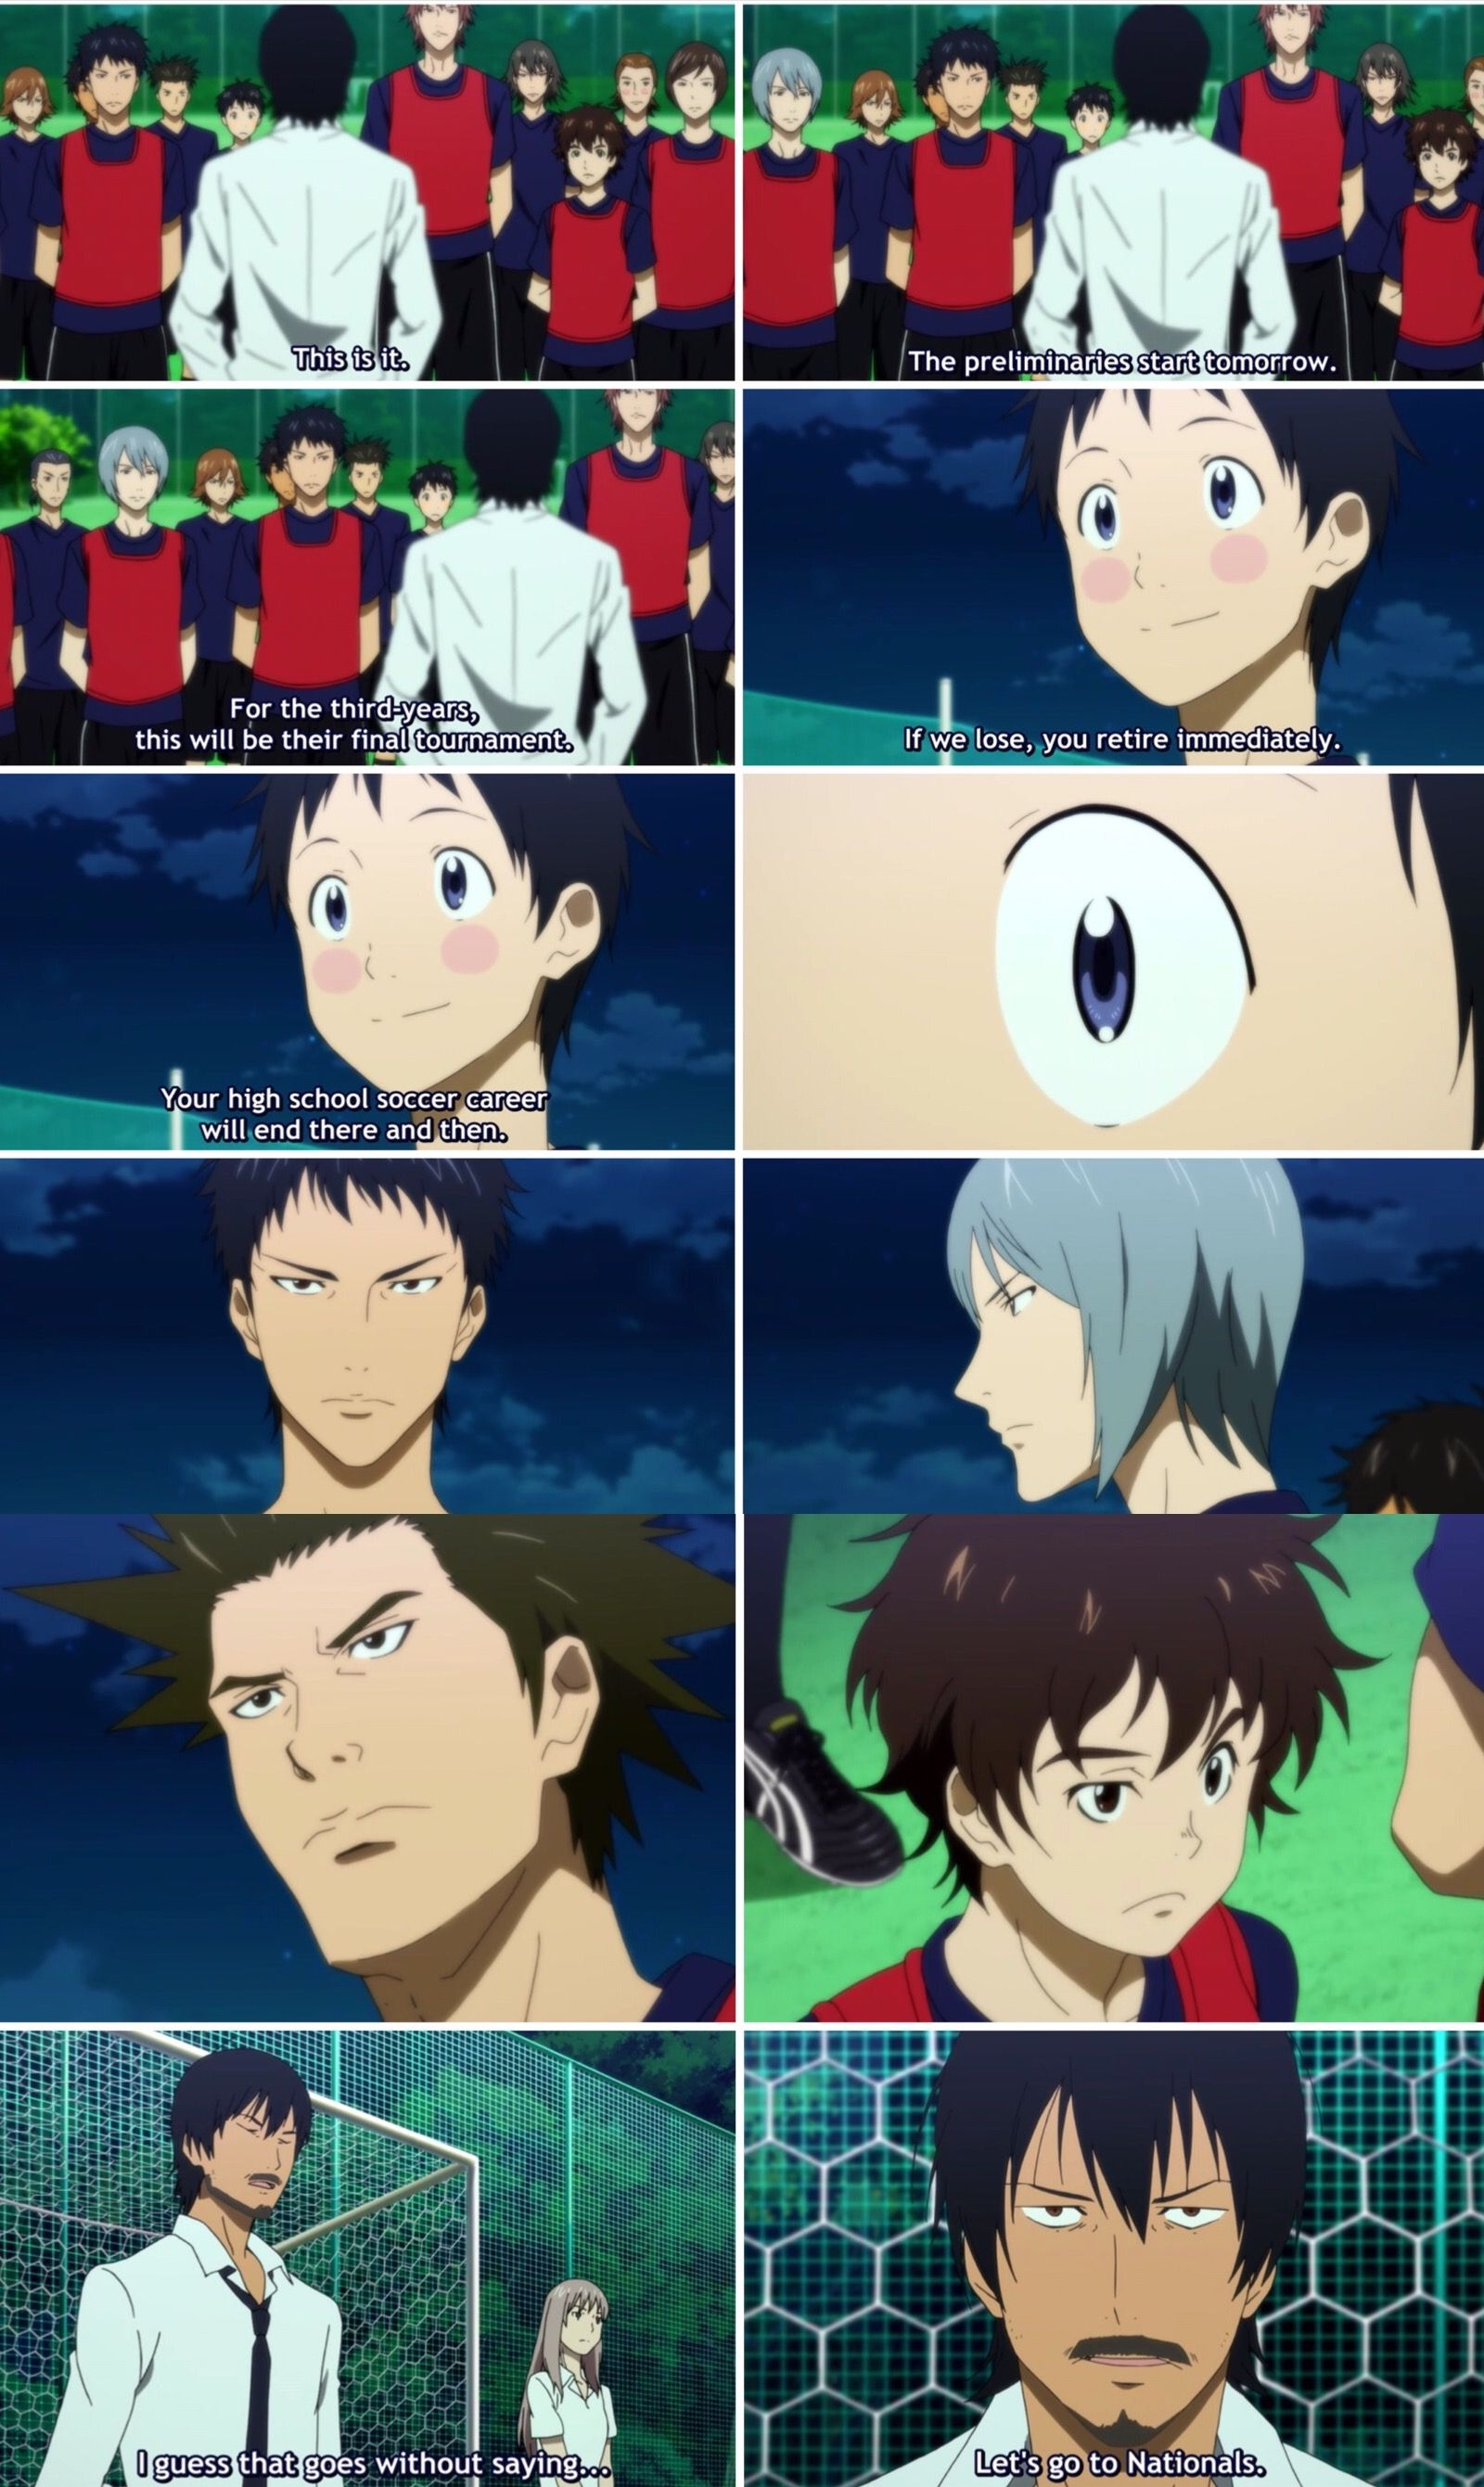 Let S Go To Nationals Days Tv Days Soccer Anime Anime Soccer Day